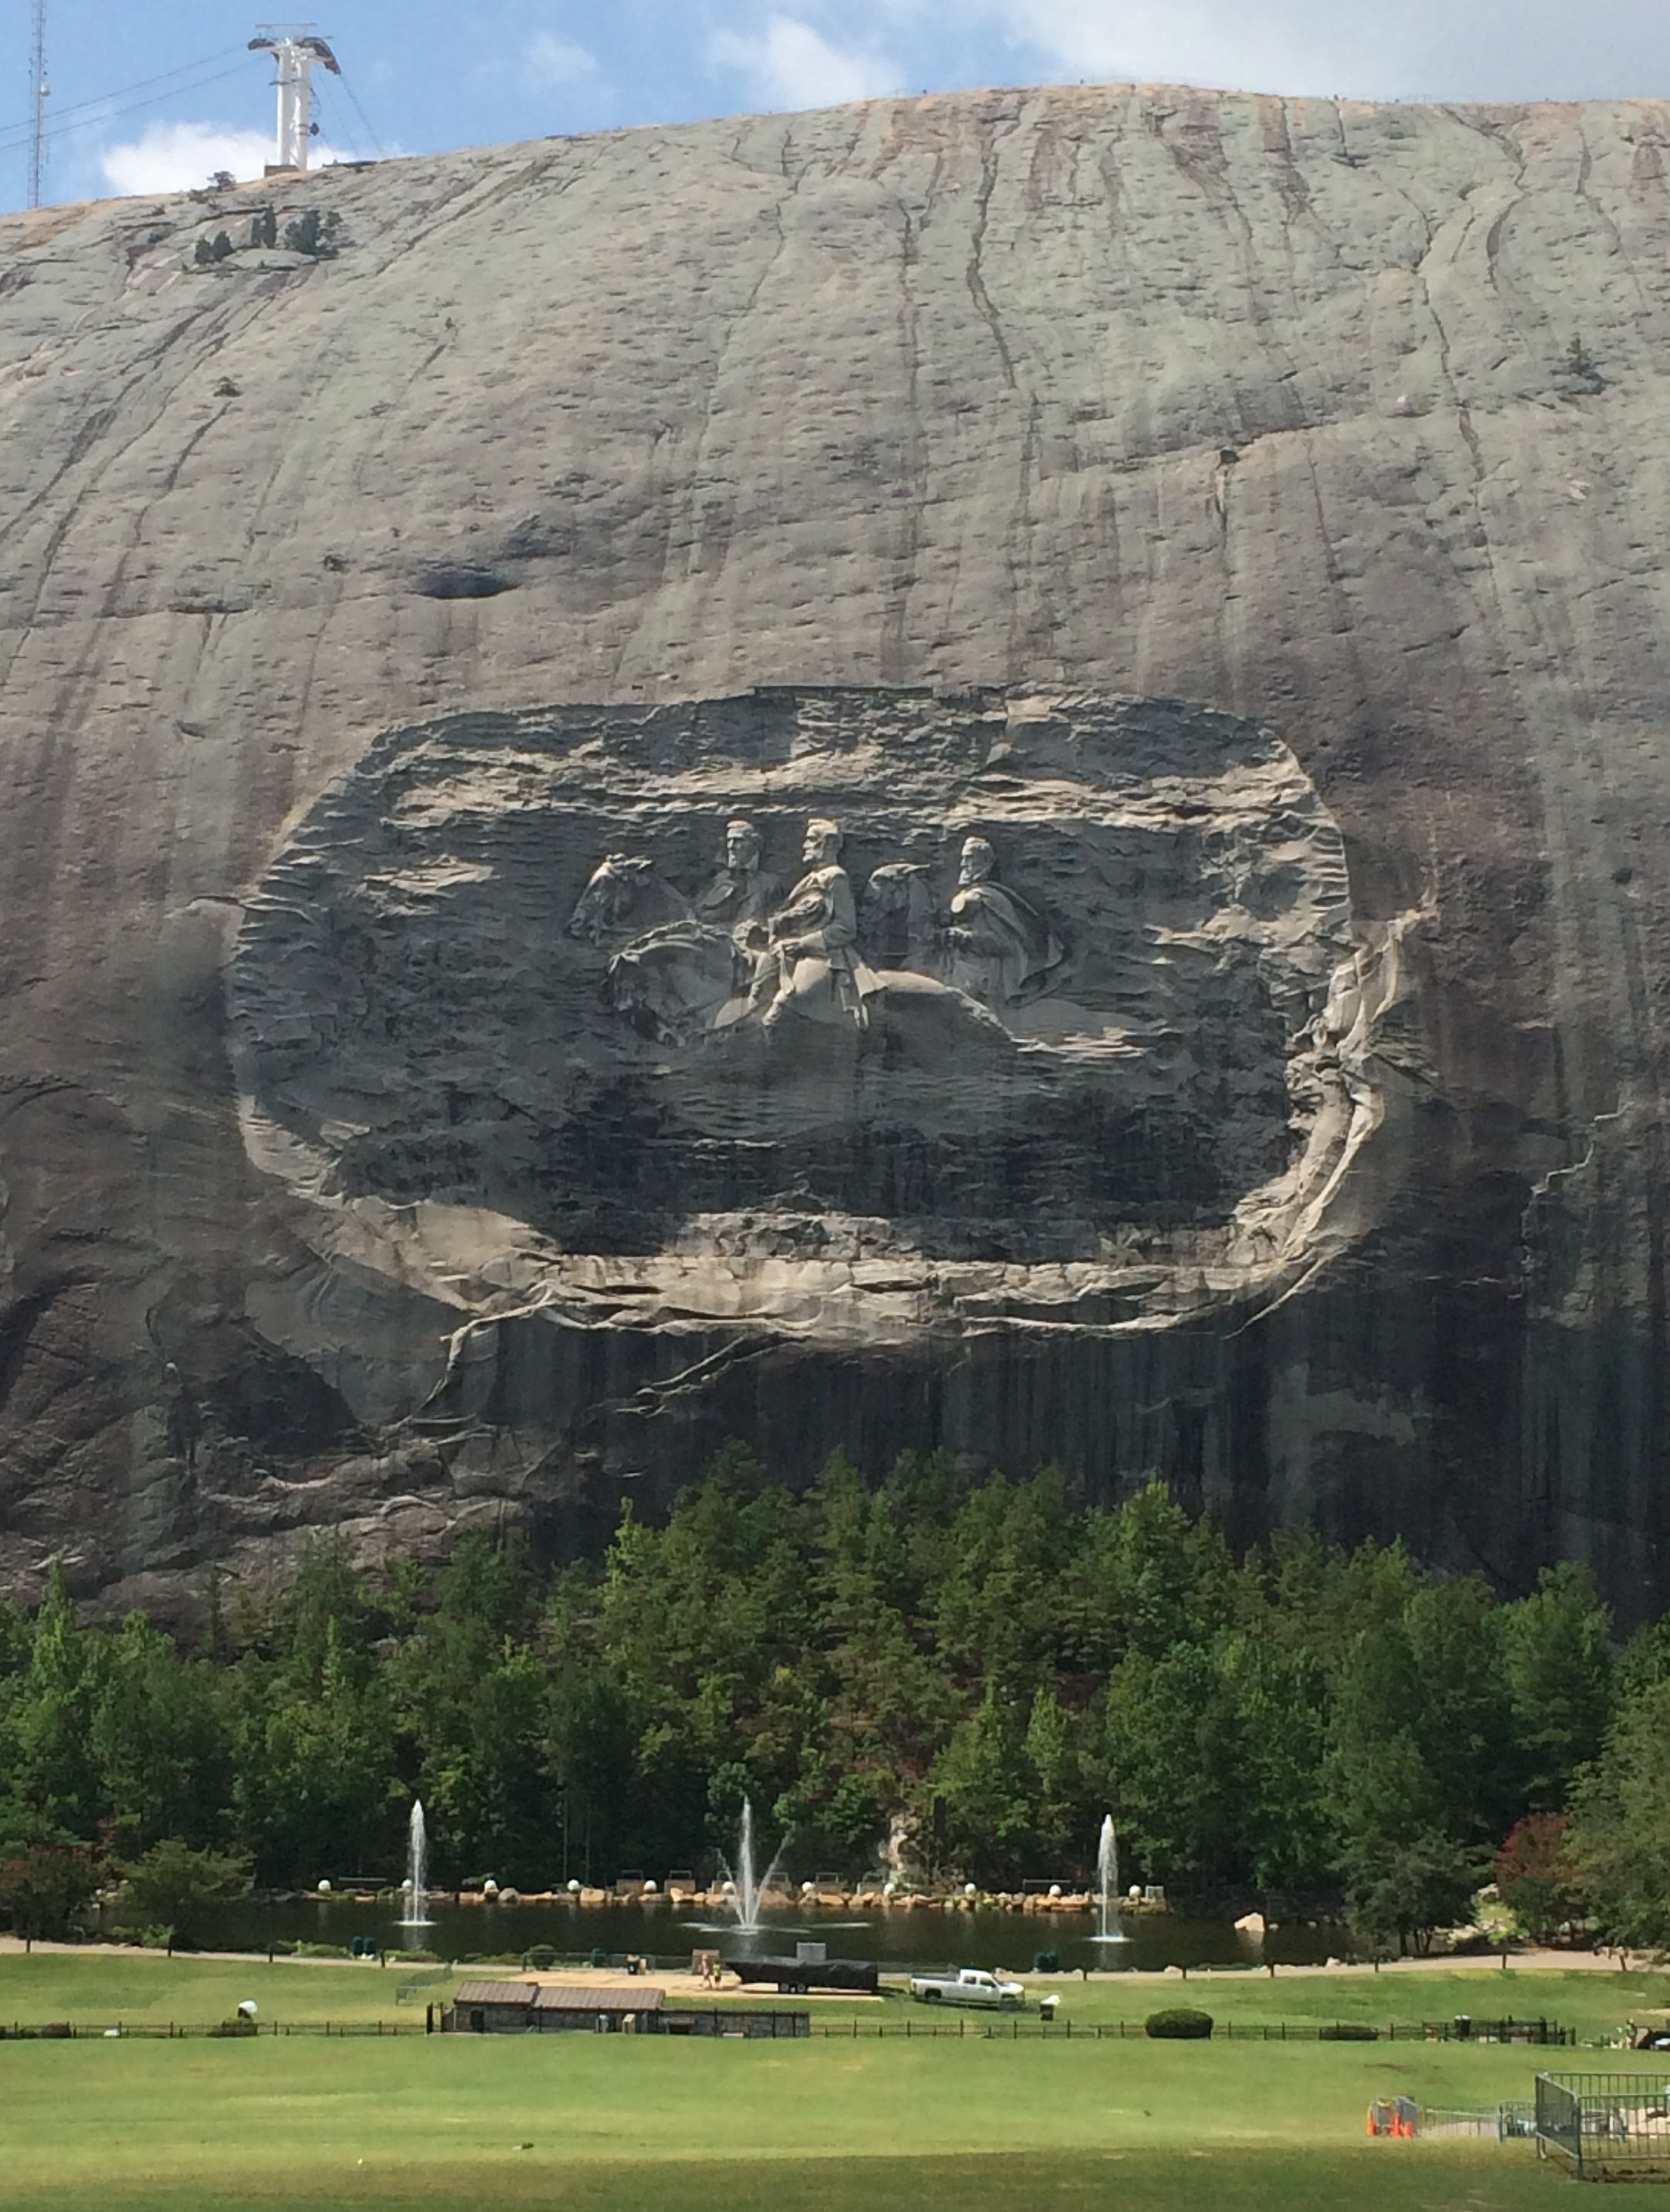 stone-mountain-016-e1408295207173.jpg